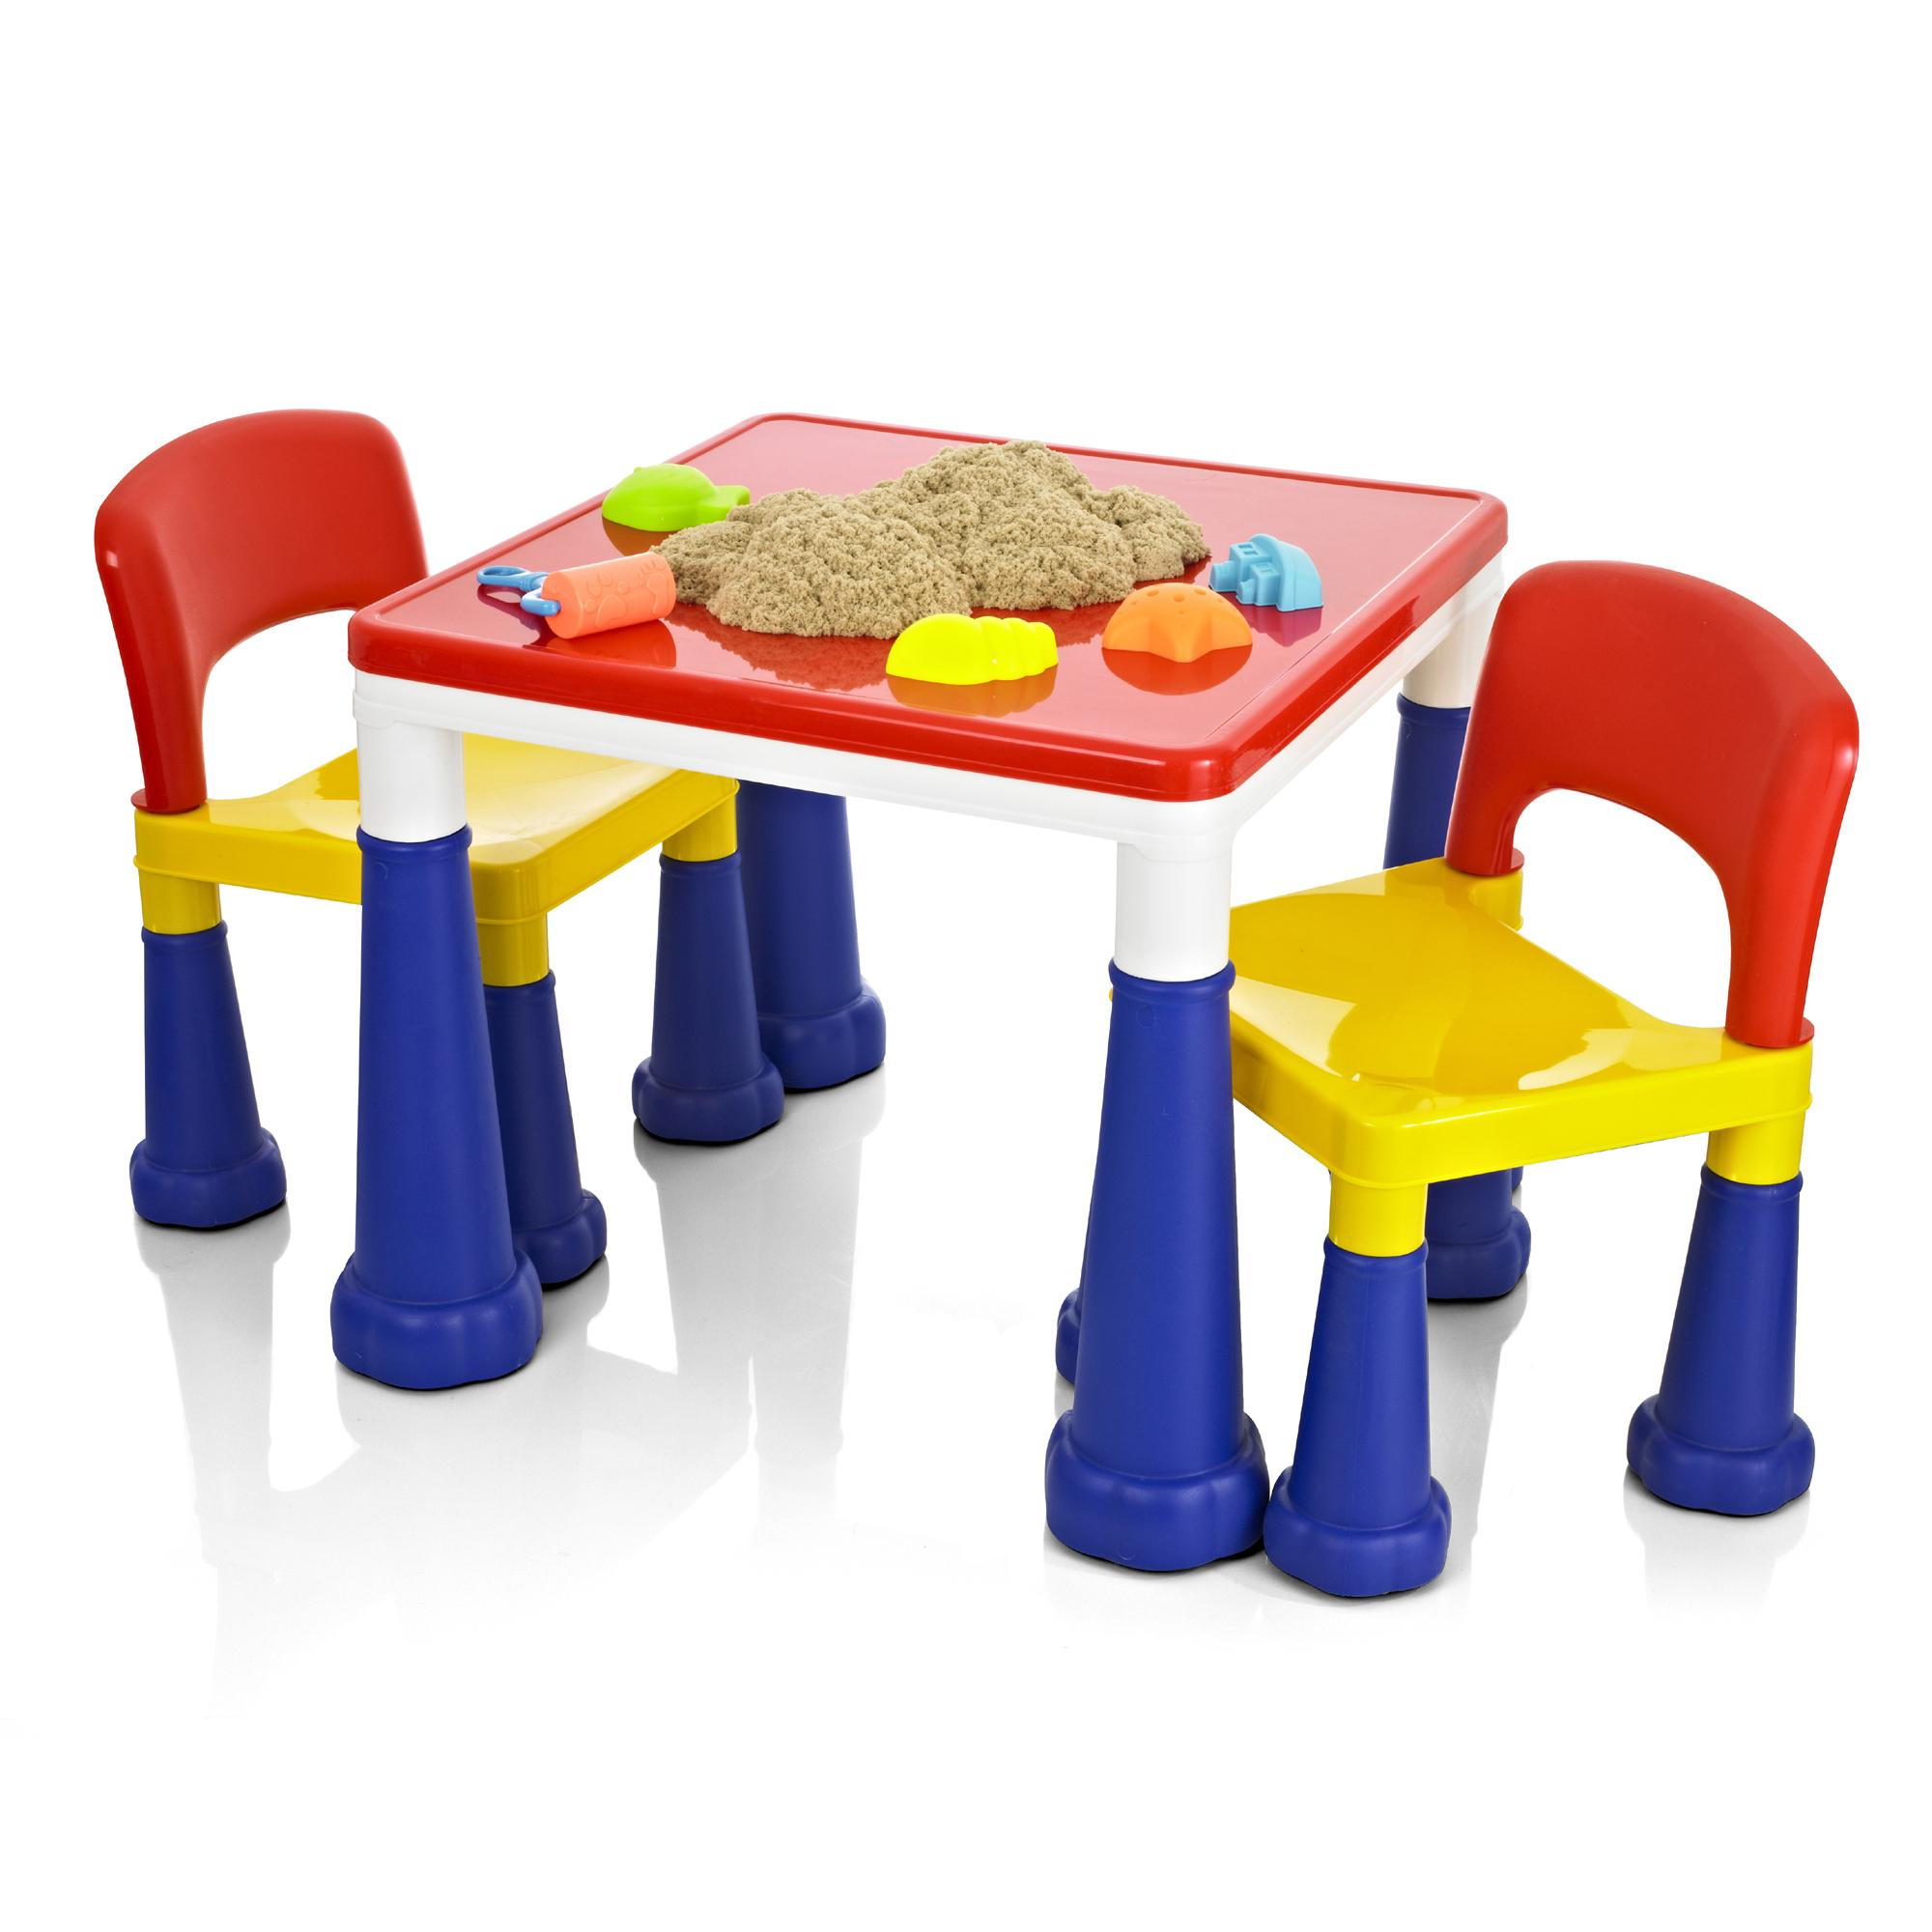 childrens kids lego duplo building activity play colouring. Black Bedroom Furniture Sets. Home Design Ideas